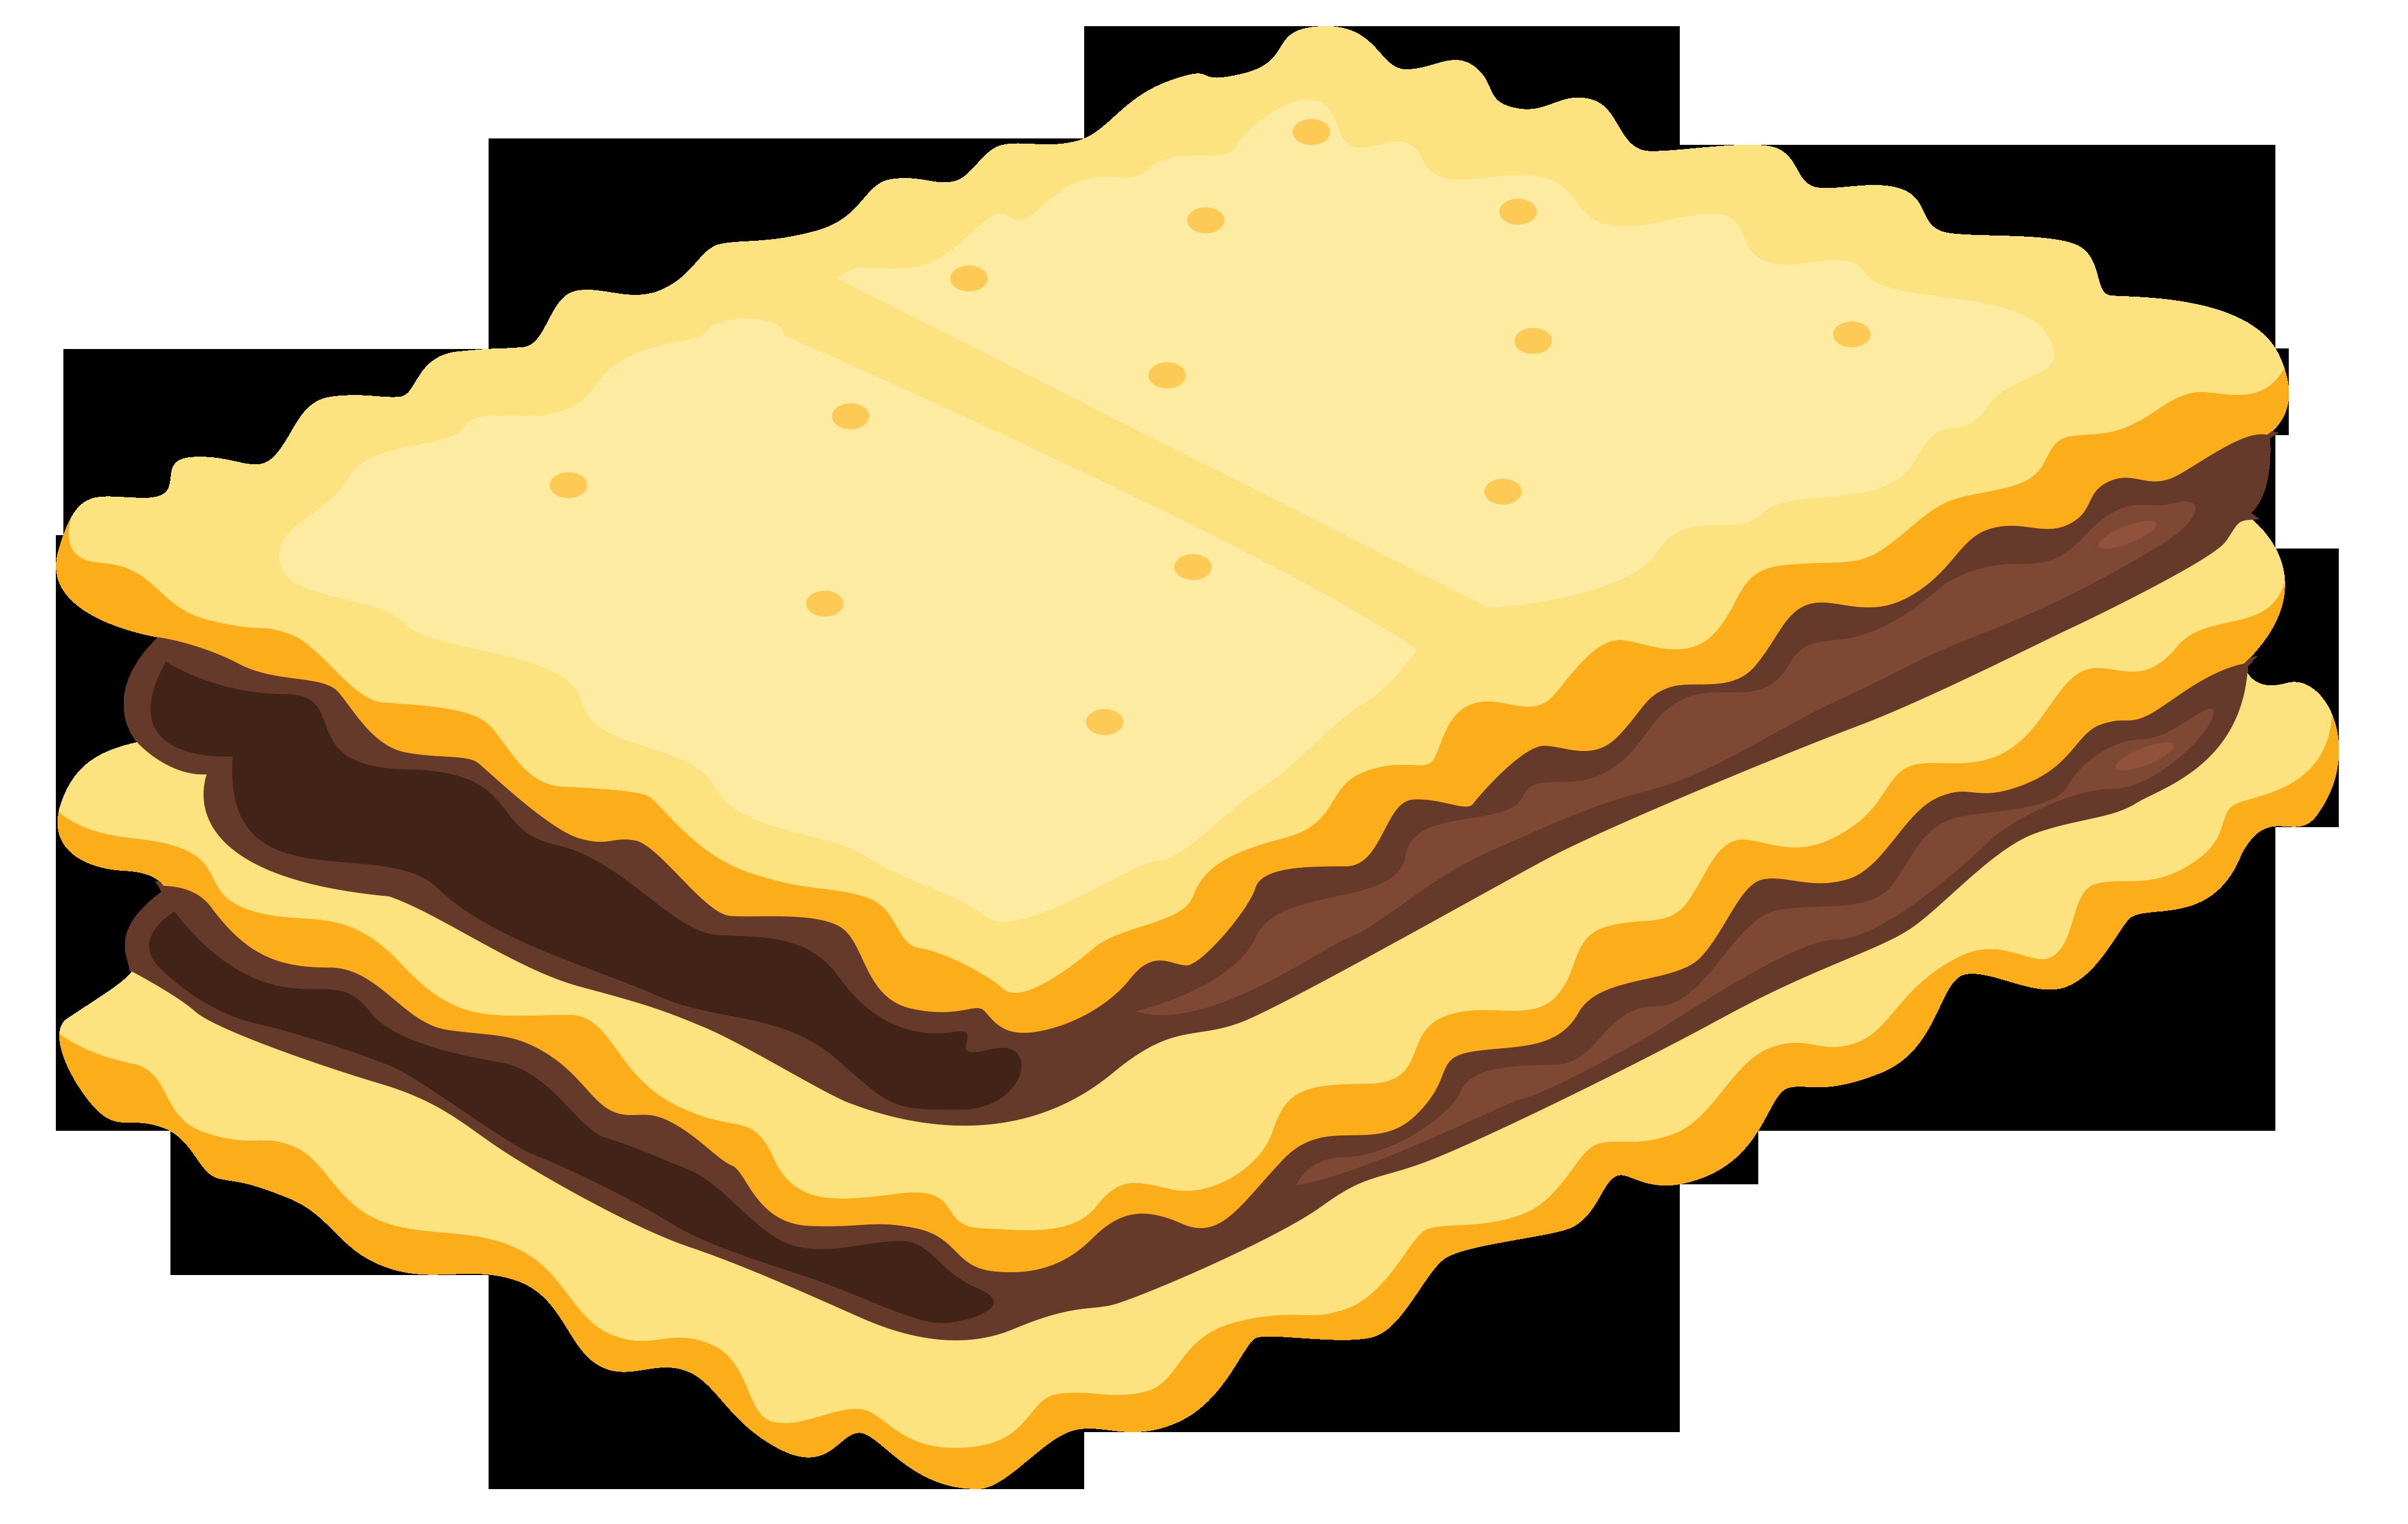 Sandwich biscuit with chocolate. Cookies clipart pumpkin cookie